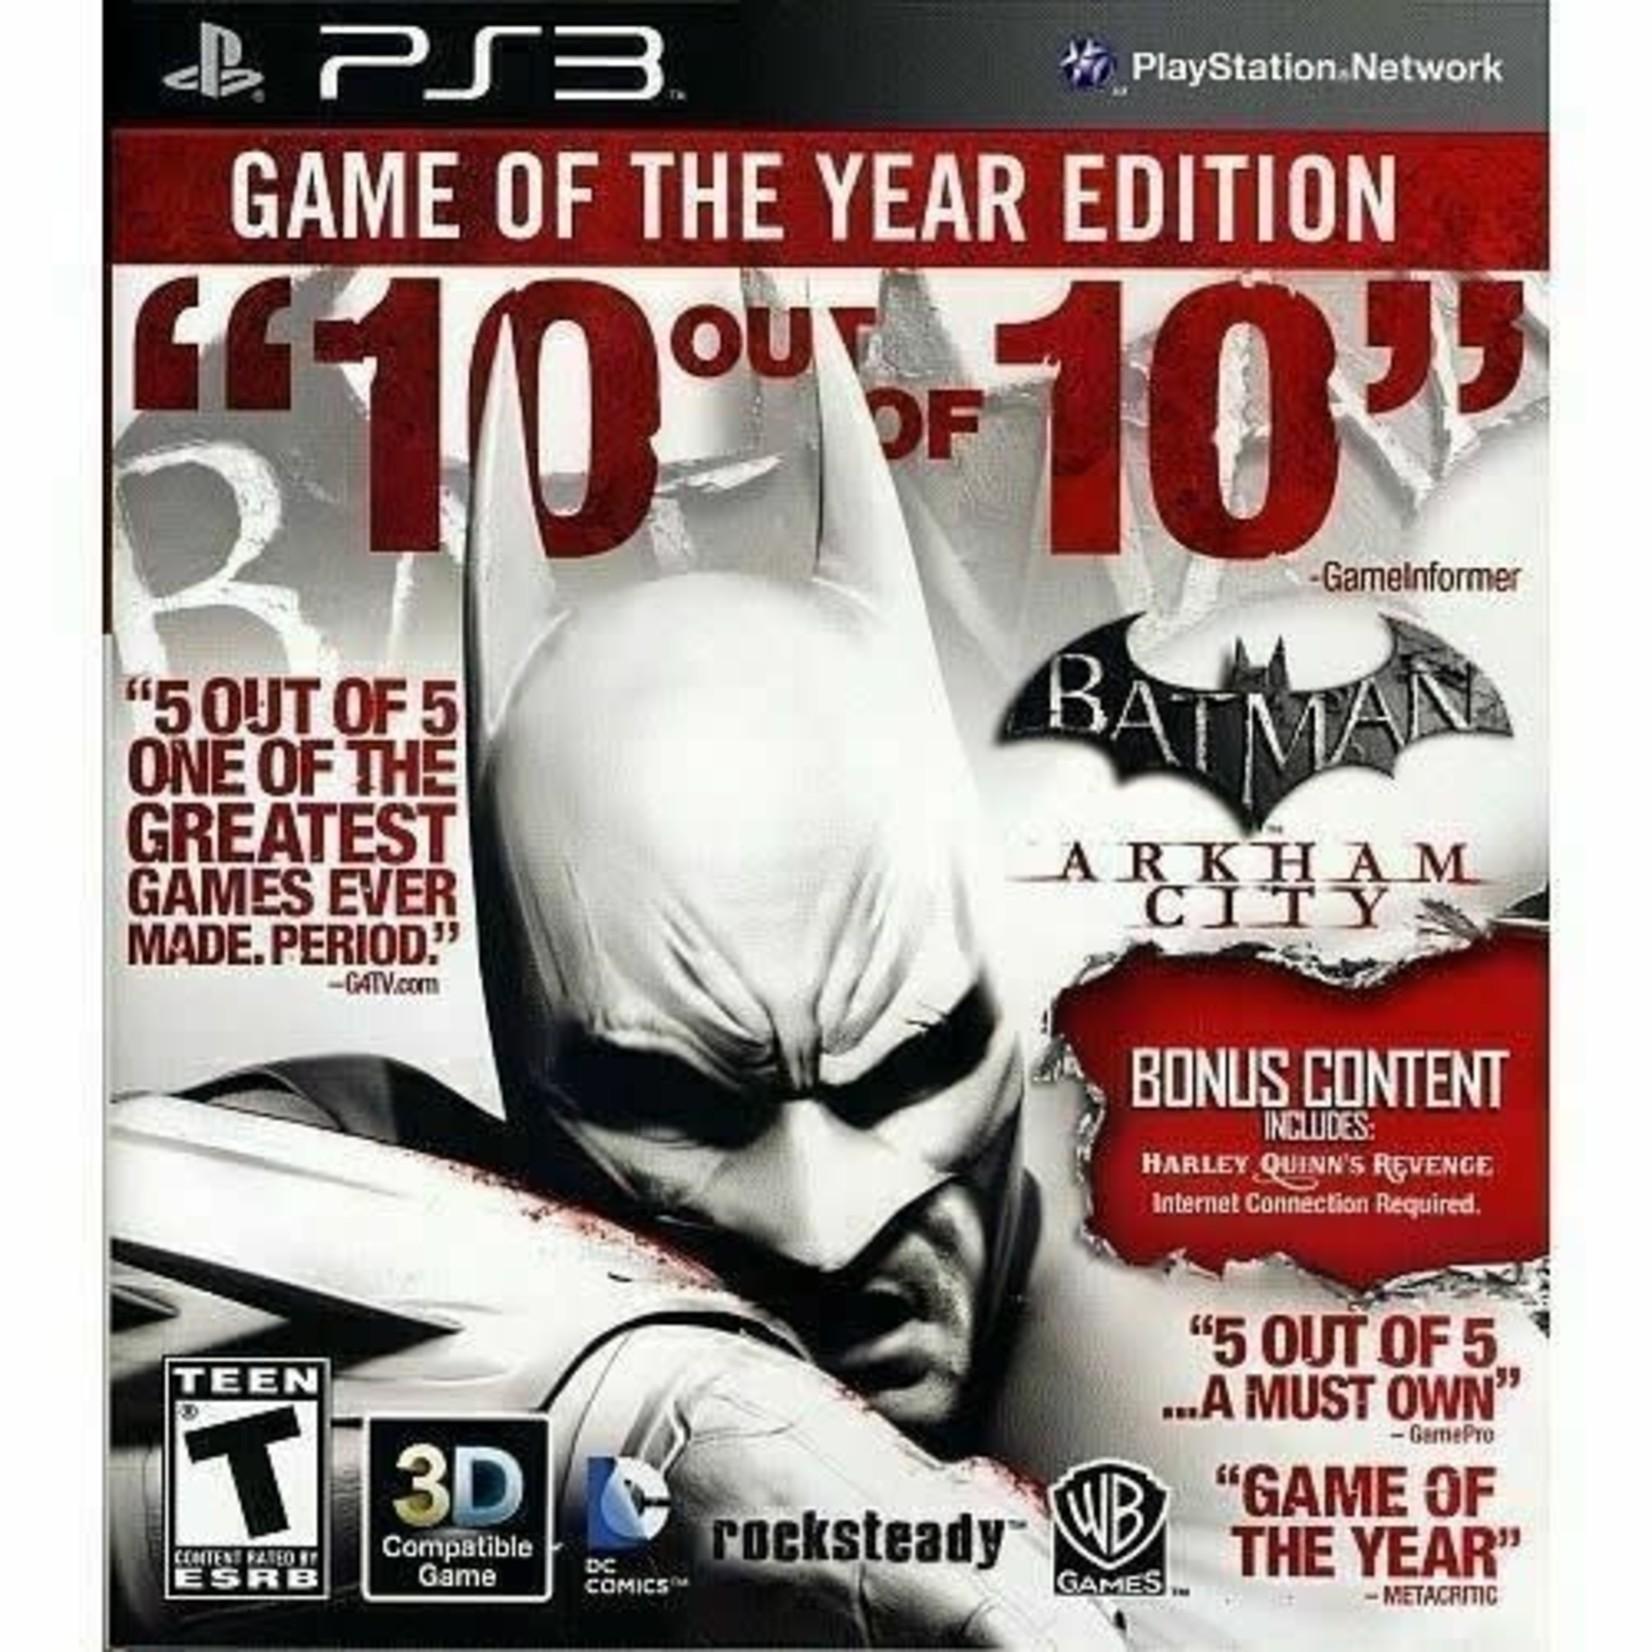 PS3U-Batman: Arkham City Game of the Year Edition